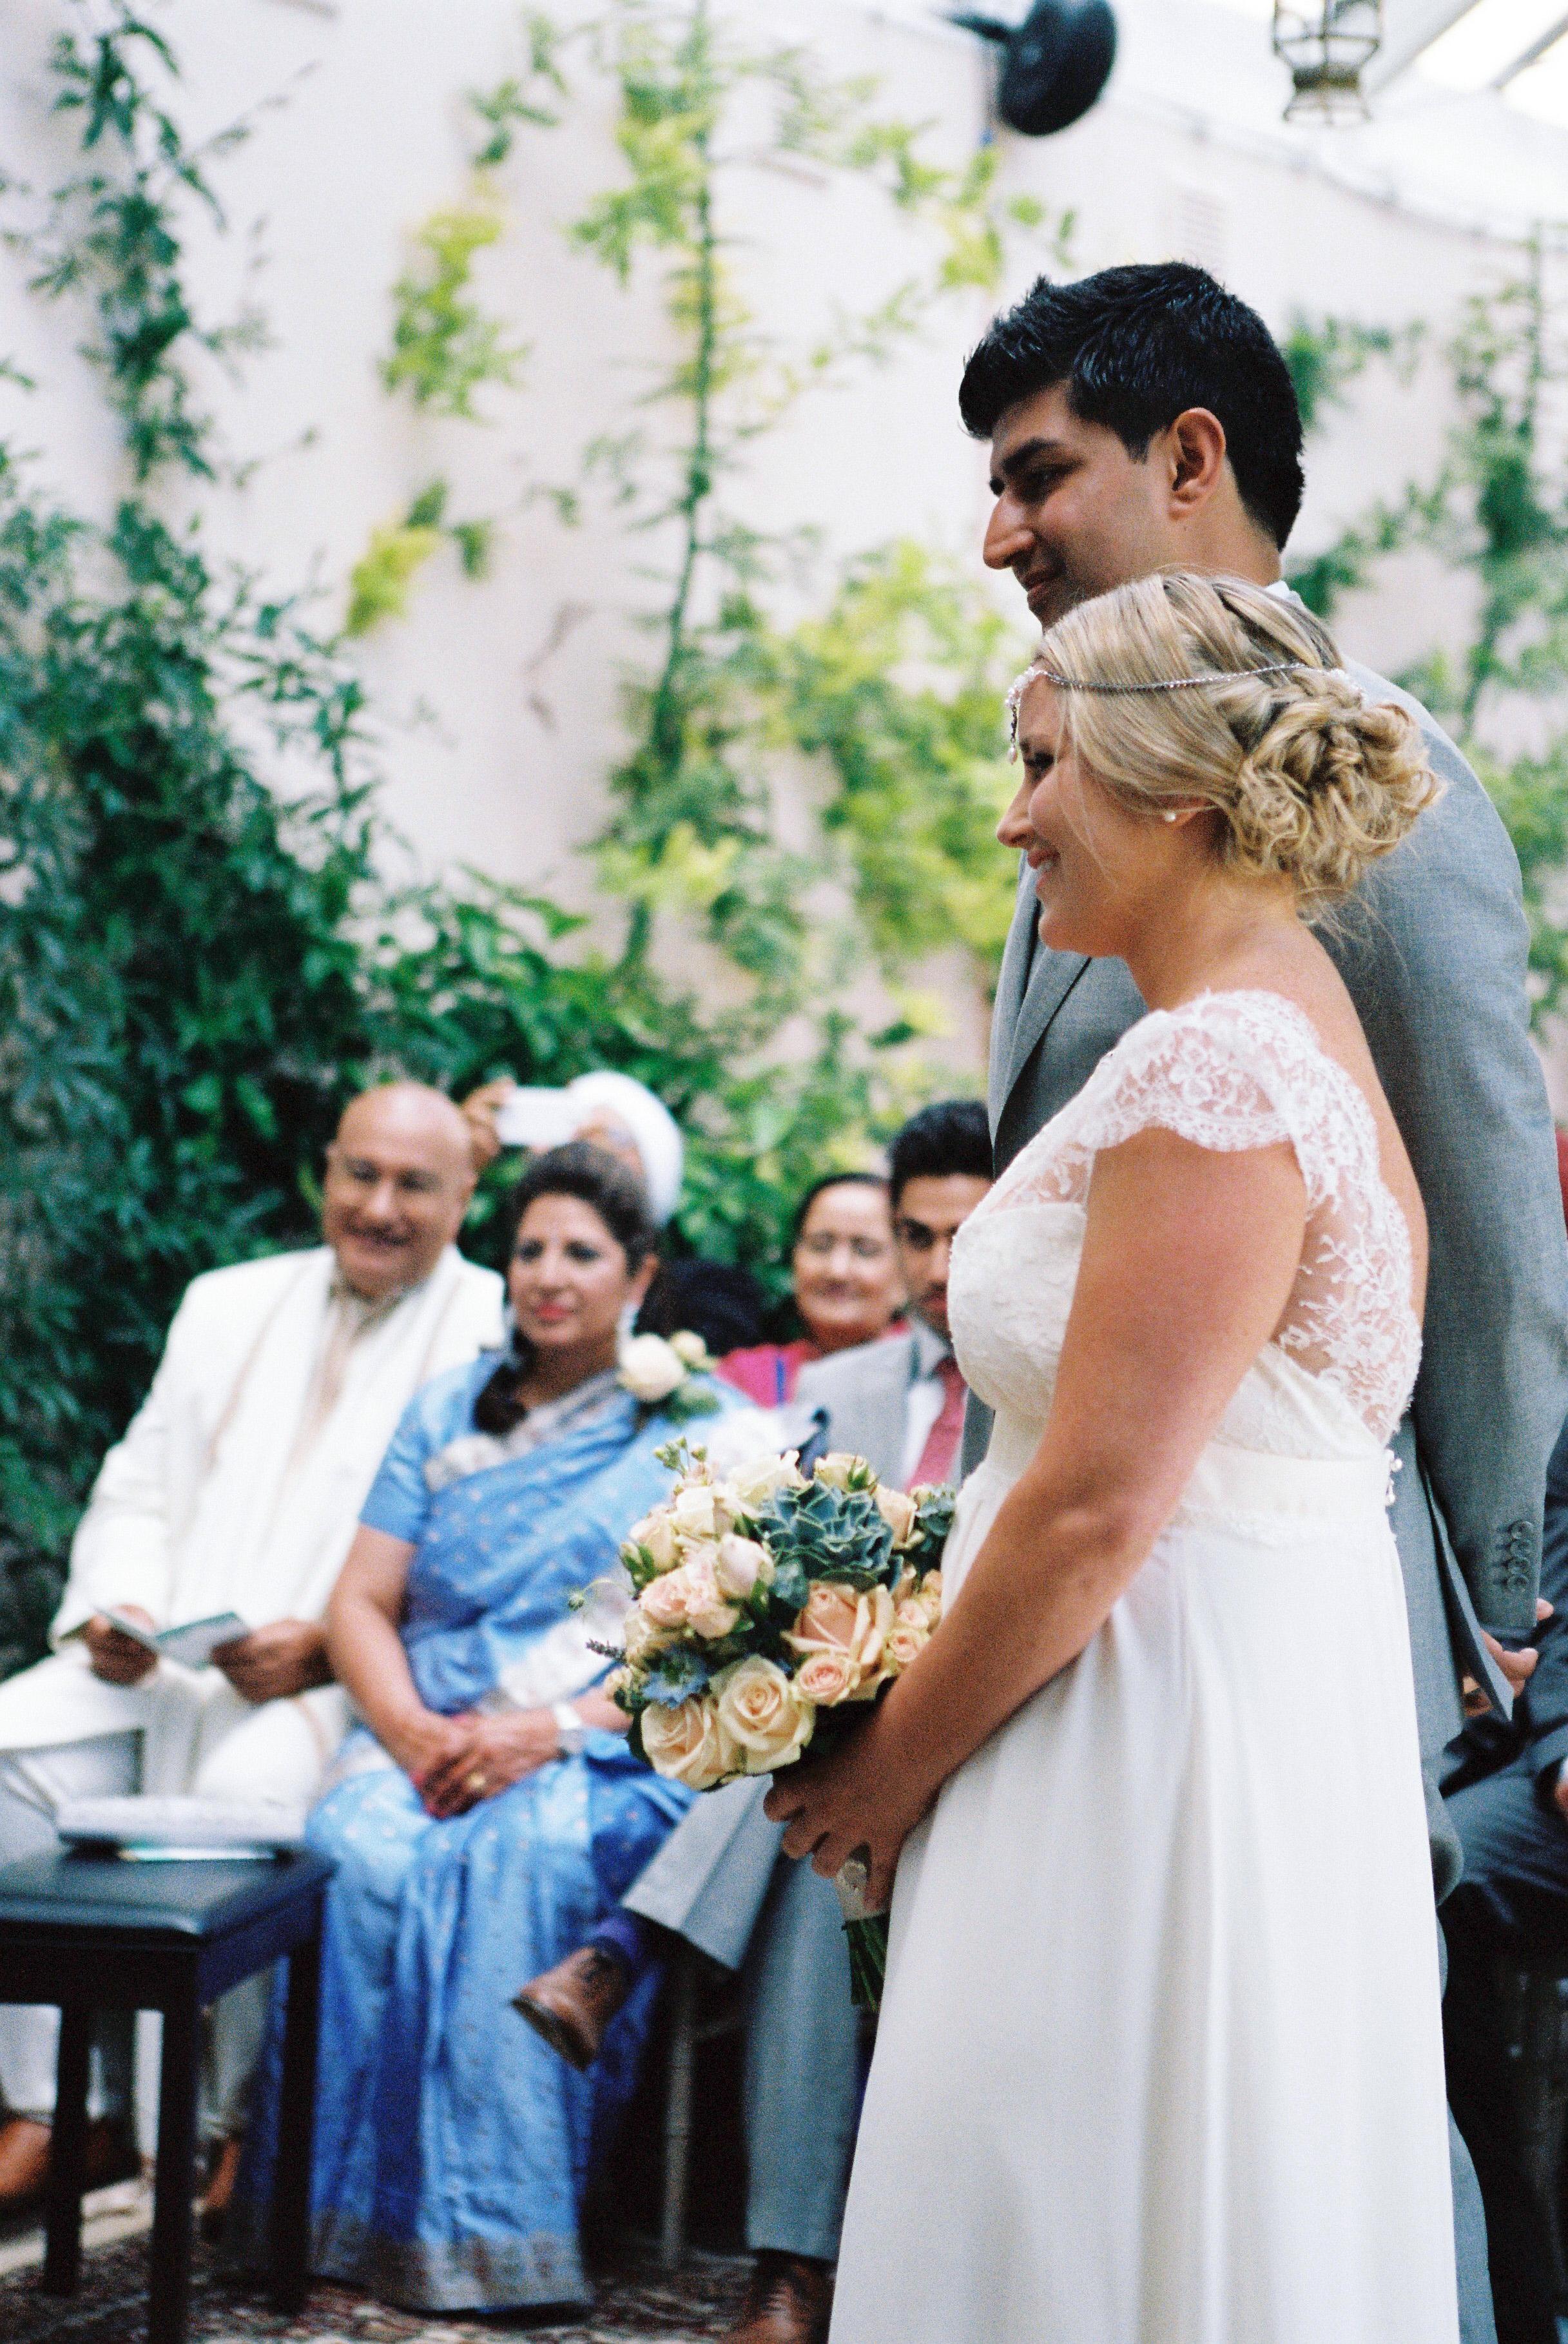 RW_Sezincote_Wedding_094.jpg